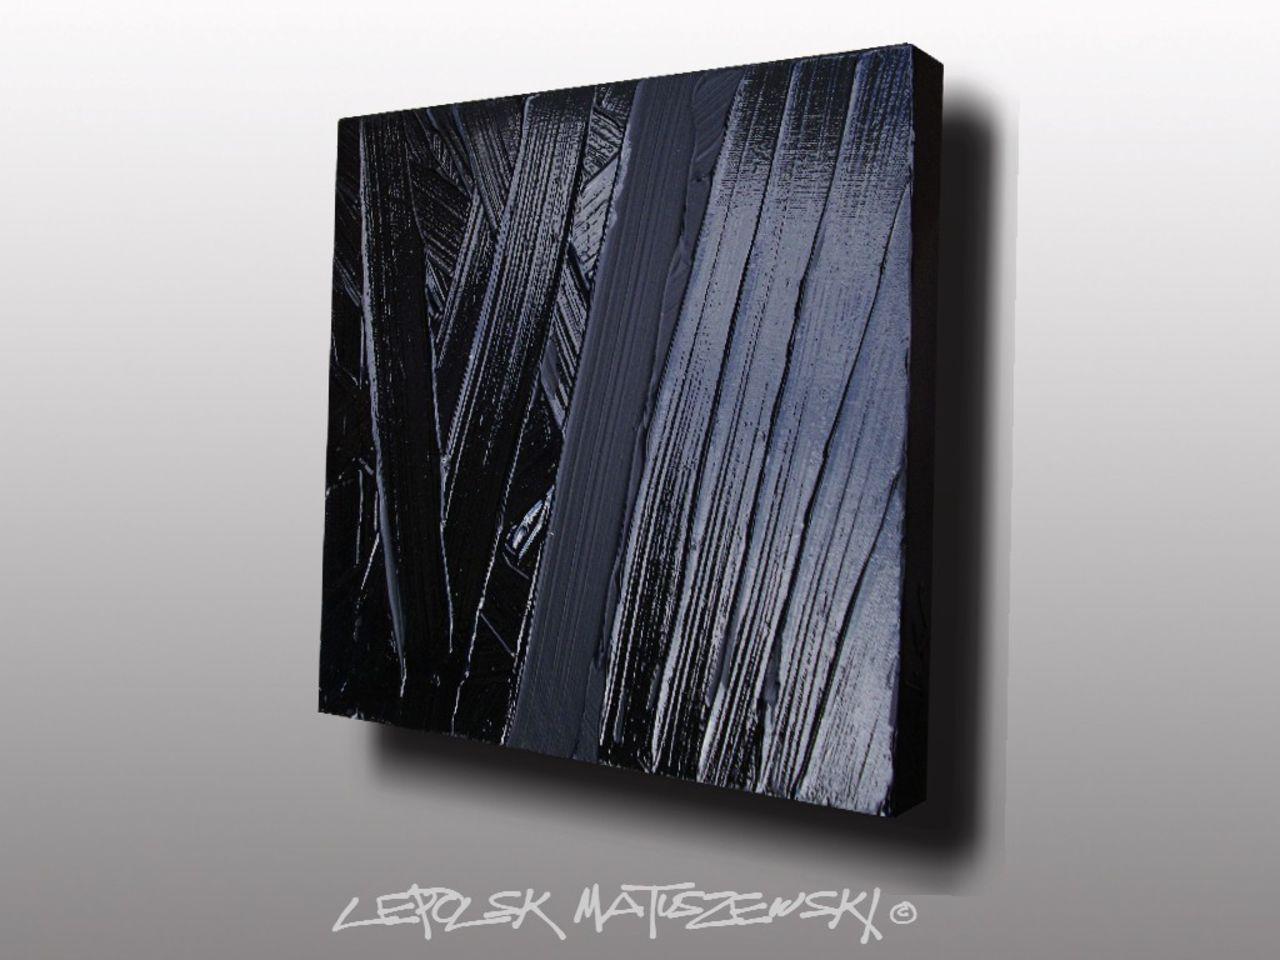 LEPOLSK MATUSZEWSKI AVEYRONART (hommage) Lepolsk Matuszewski    Expressionnisme abstrait contemporain